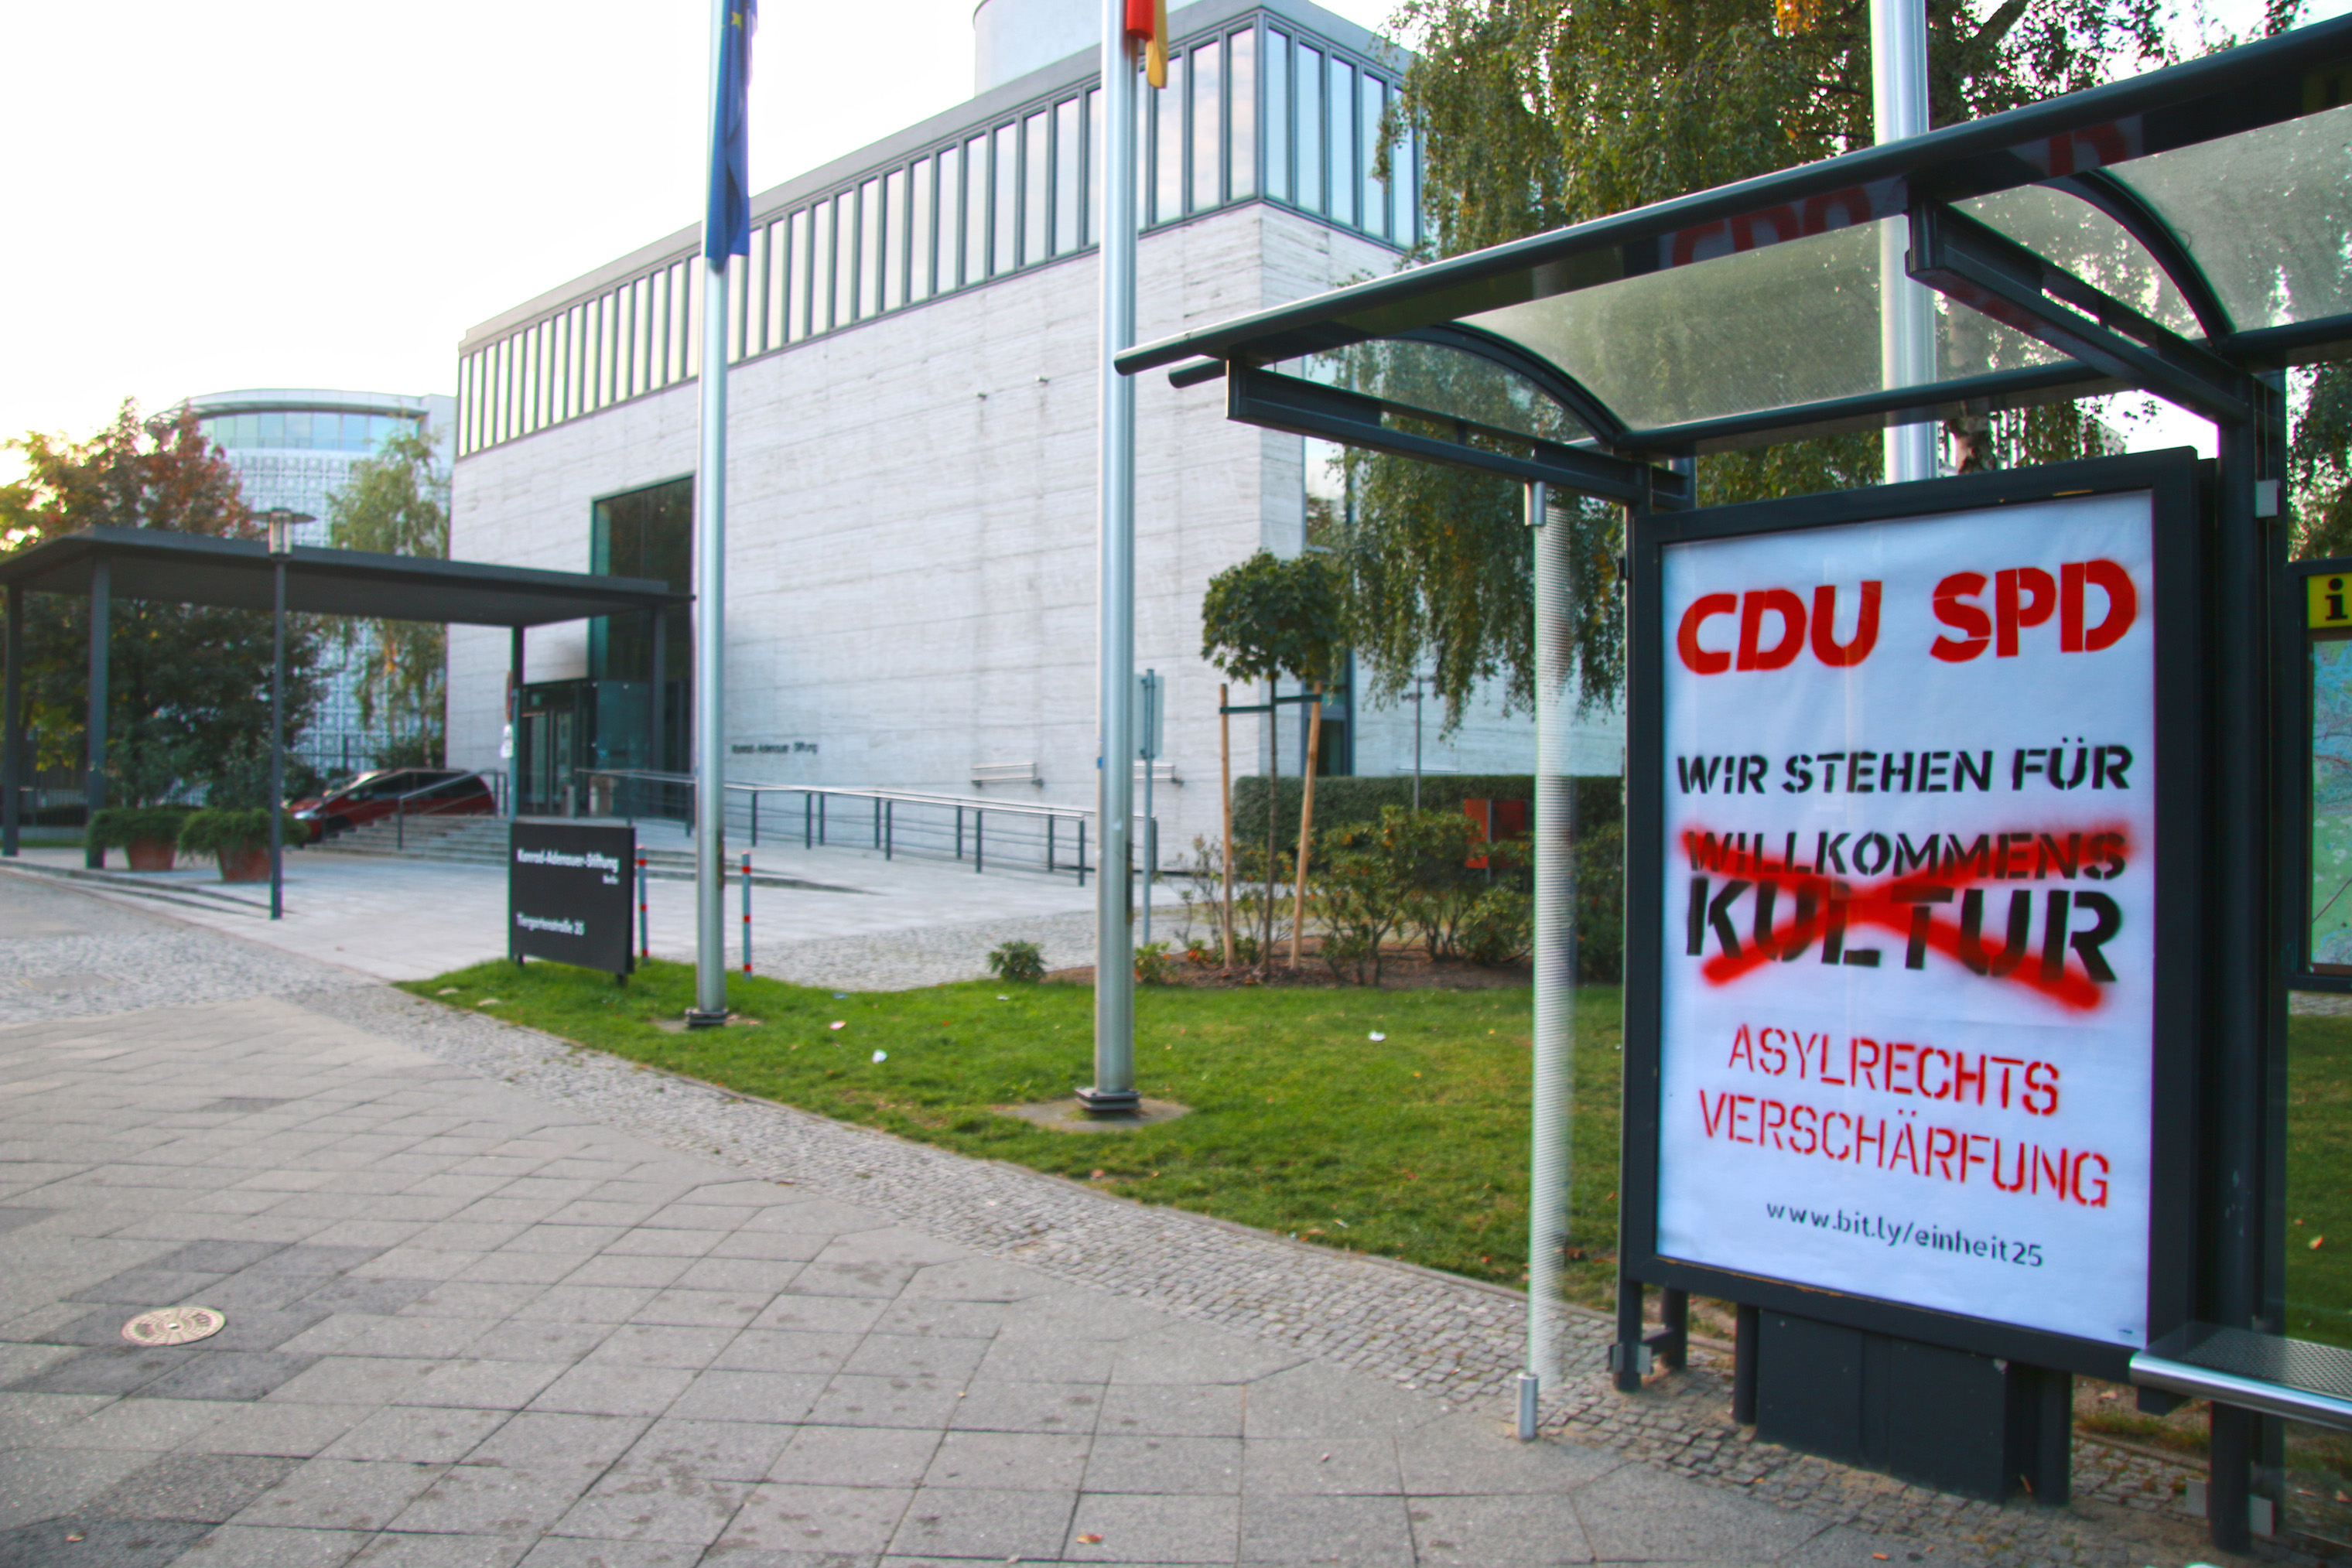 Adbusting an der Konrad-Adennauer-Stiftung, 3.10.2015